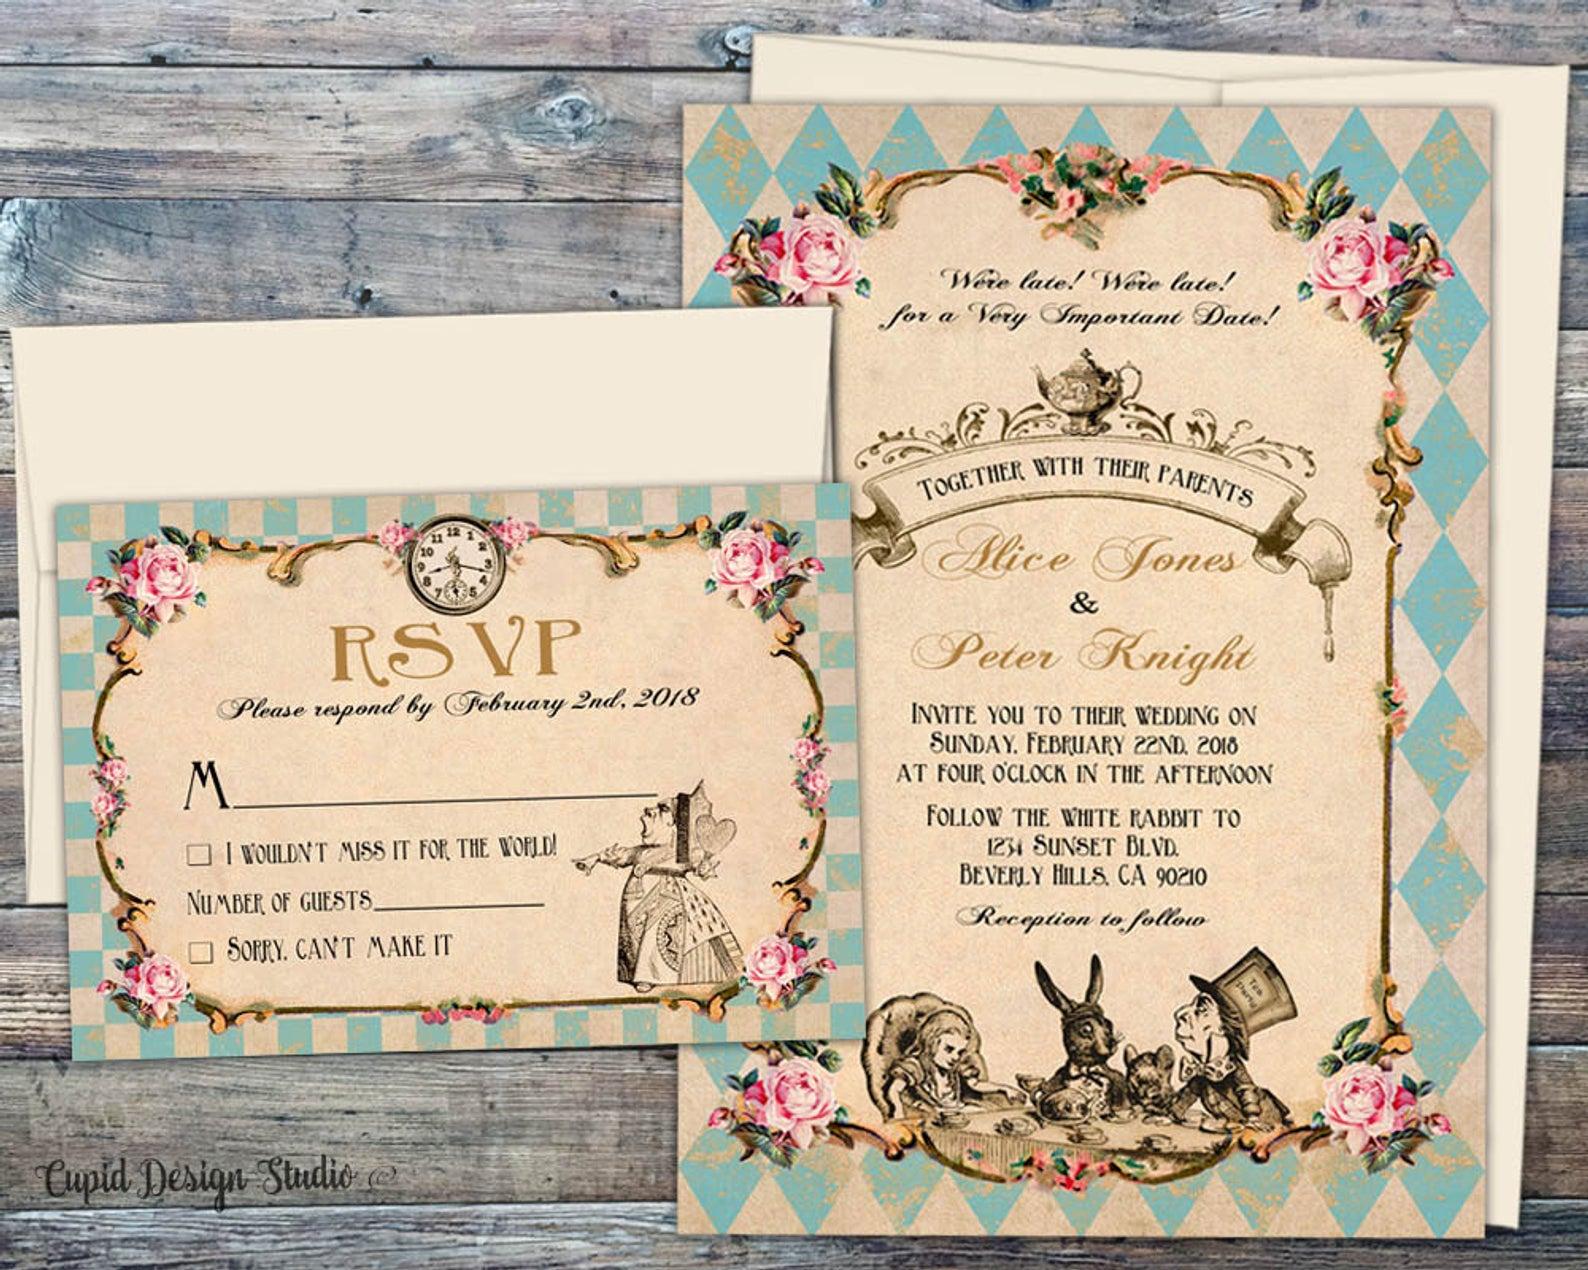 Etsy cupid designs wedding invitations